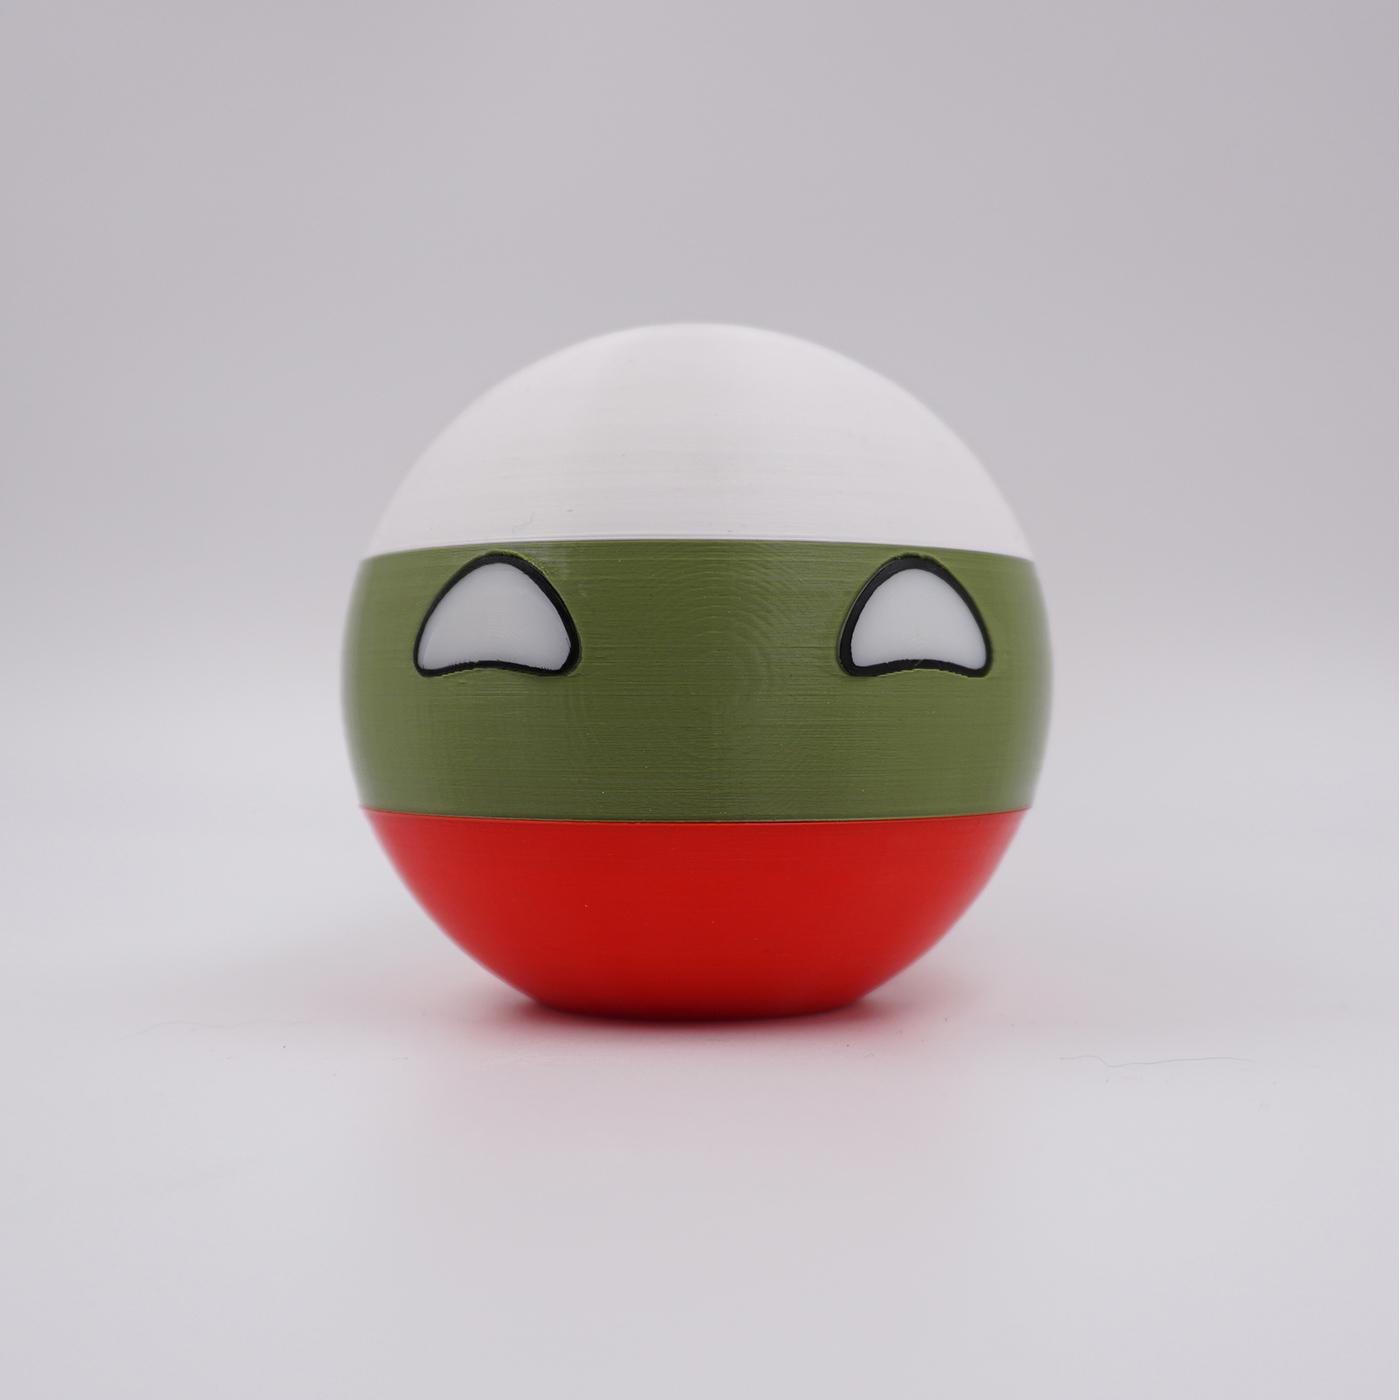 3D Druck - Countryball mit Farbwahl